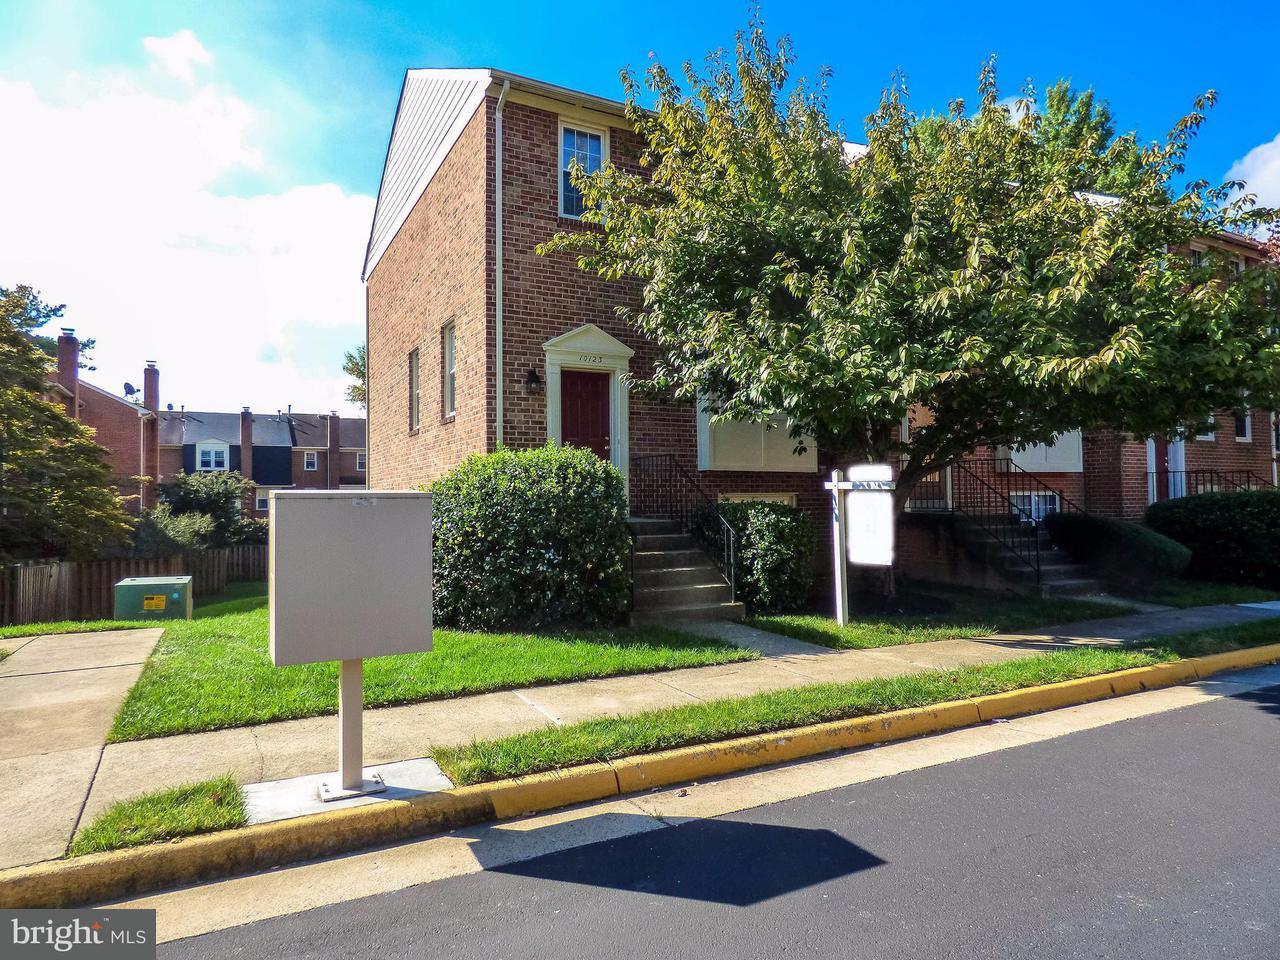 Townhouse for Sale at 10123 OAKWOOD CHASE Court 10123 OAKWOOD CHASE Court Oakton, Virginia 22124 United States